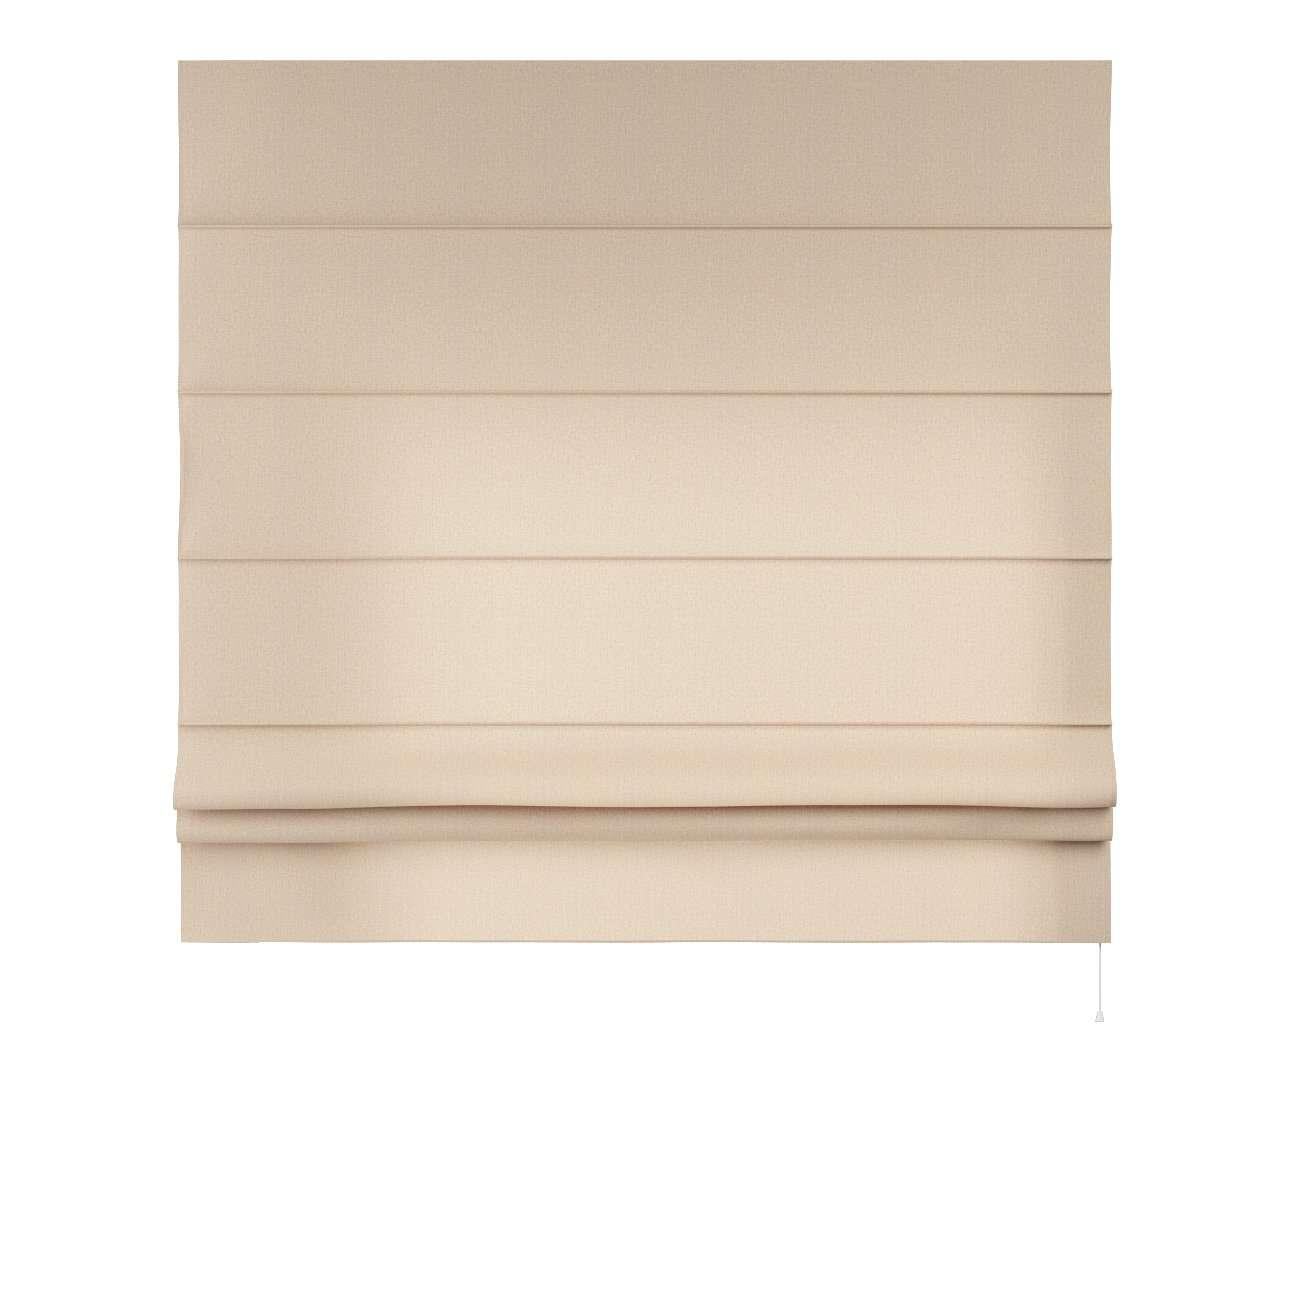 Foldegardin Paris<br/>Med lige flæse 80 × 170 cm fra kollektionen Edinburgh, Stof: 115-78